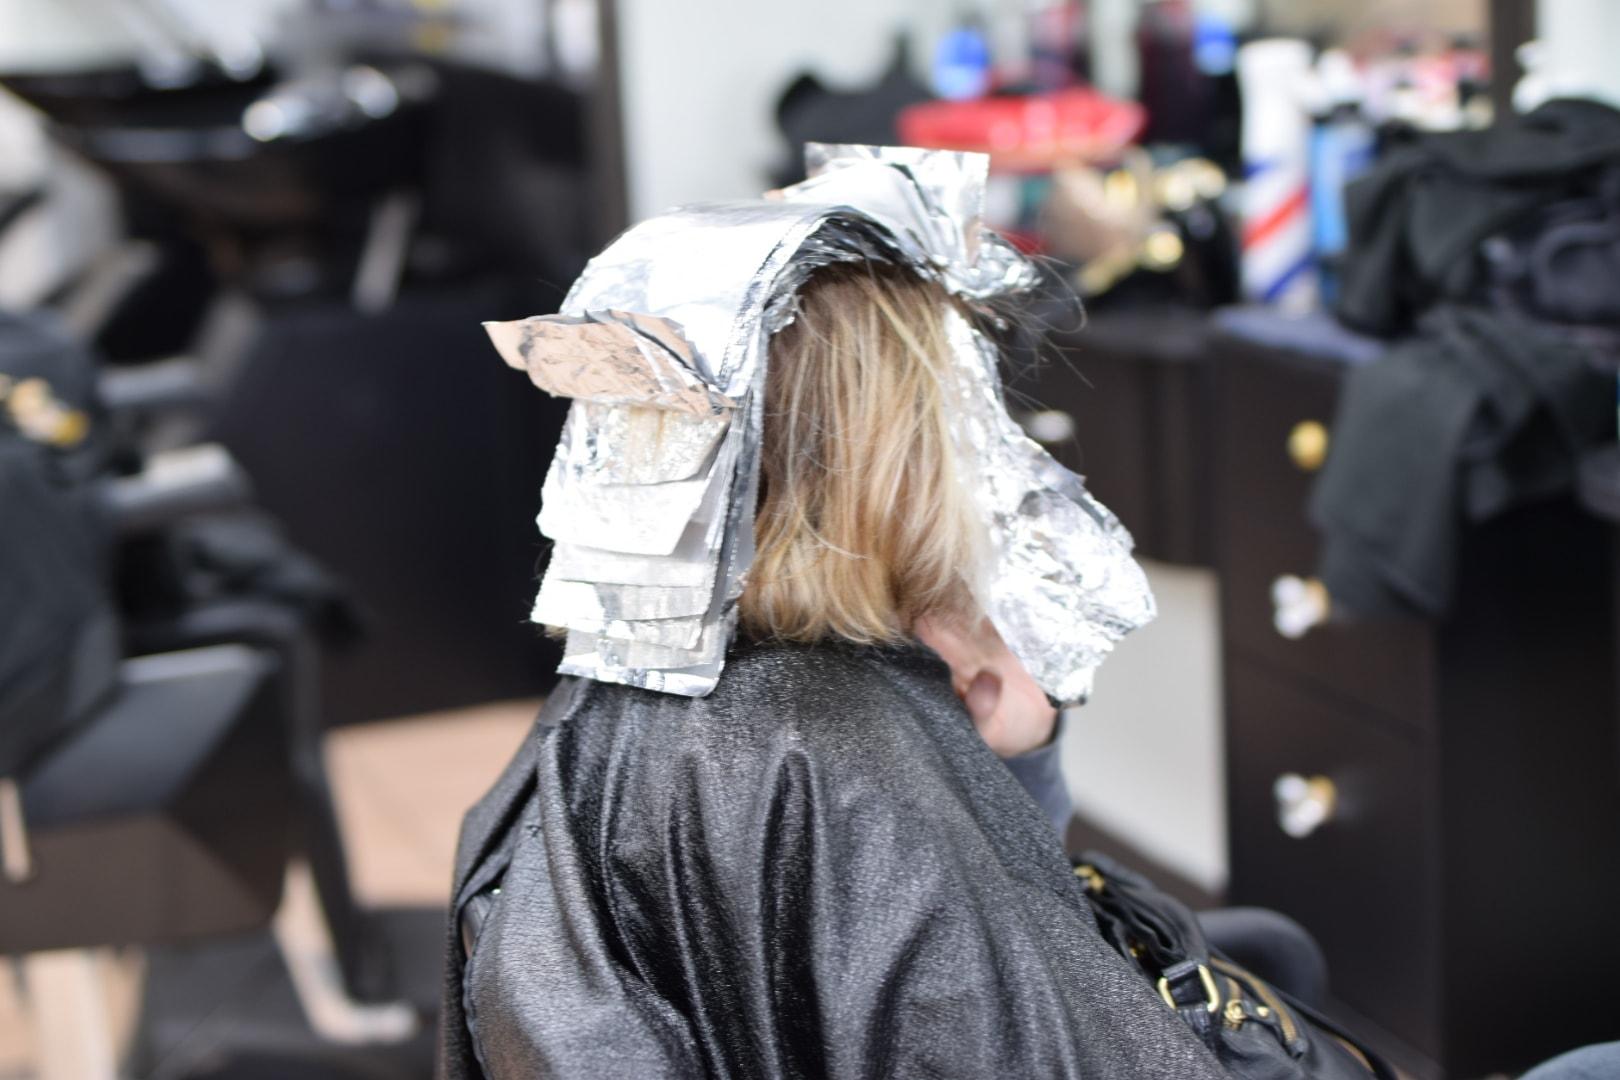 Phily's Cuts, Brick NJ, foils, bleach, hair, haircare, hair color, blonde, ocean county nj, Bricktown